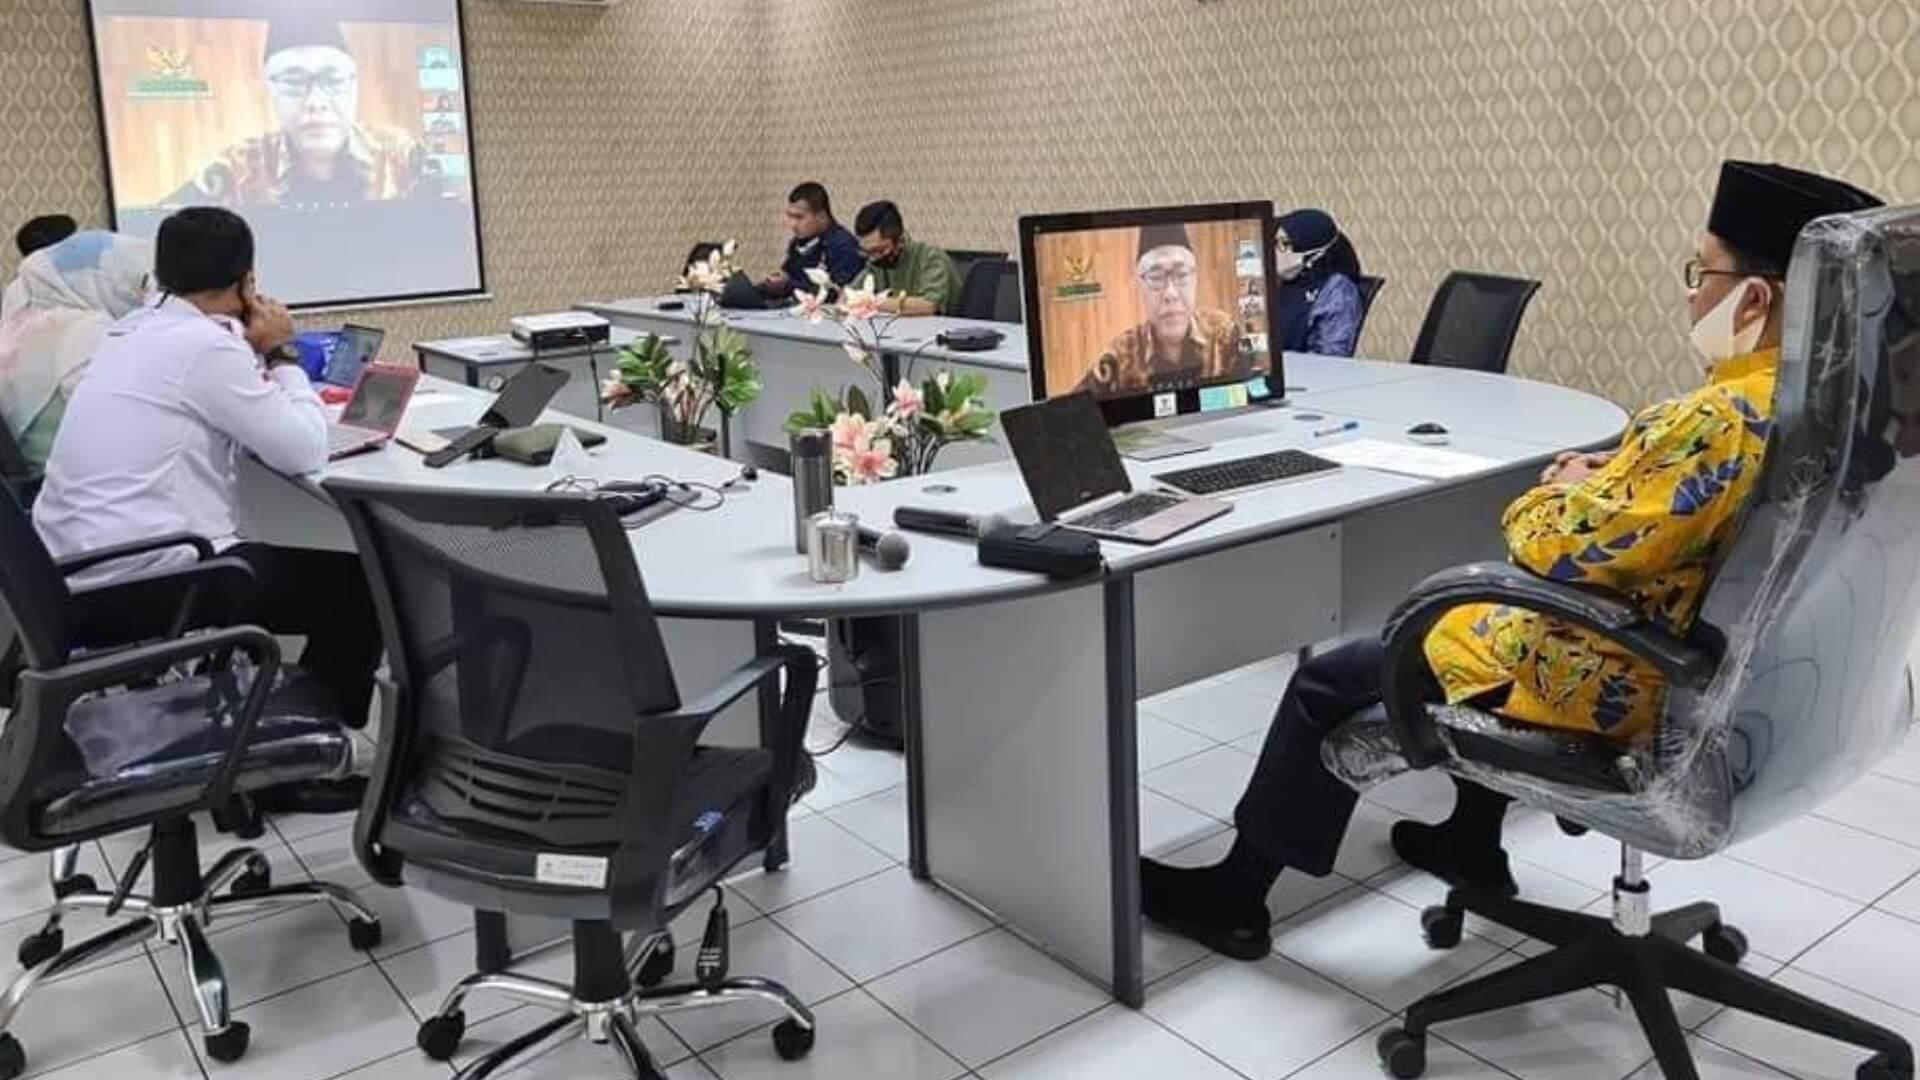 baznas-pusat-pimpinan-ntb-rakornas-zakat-online